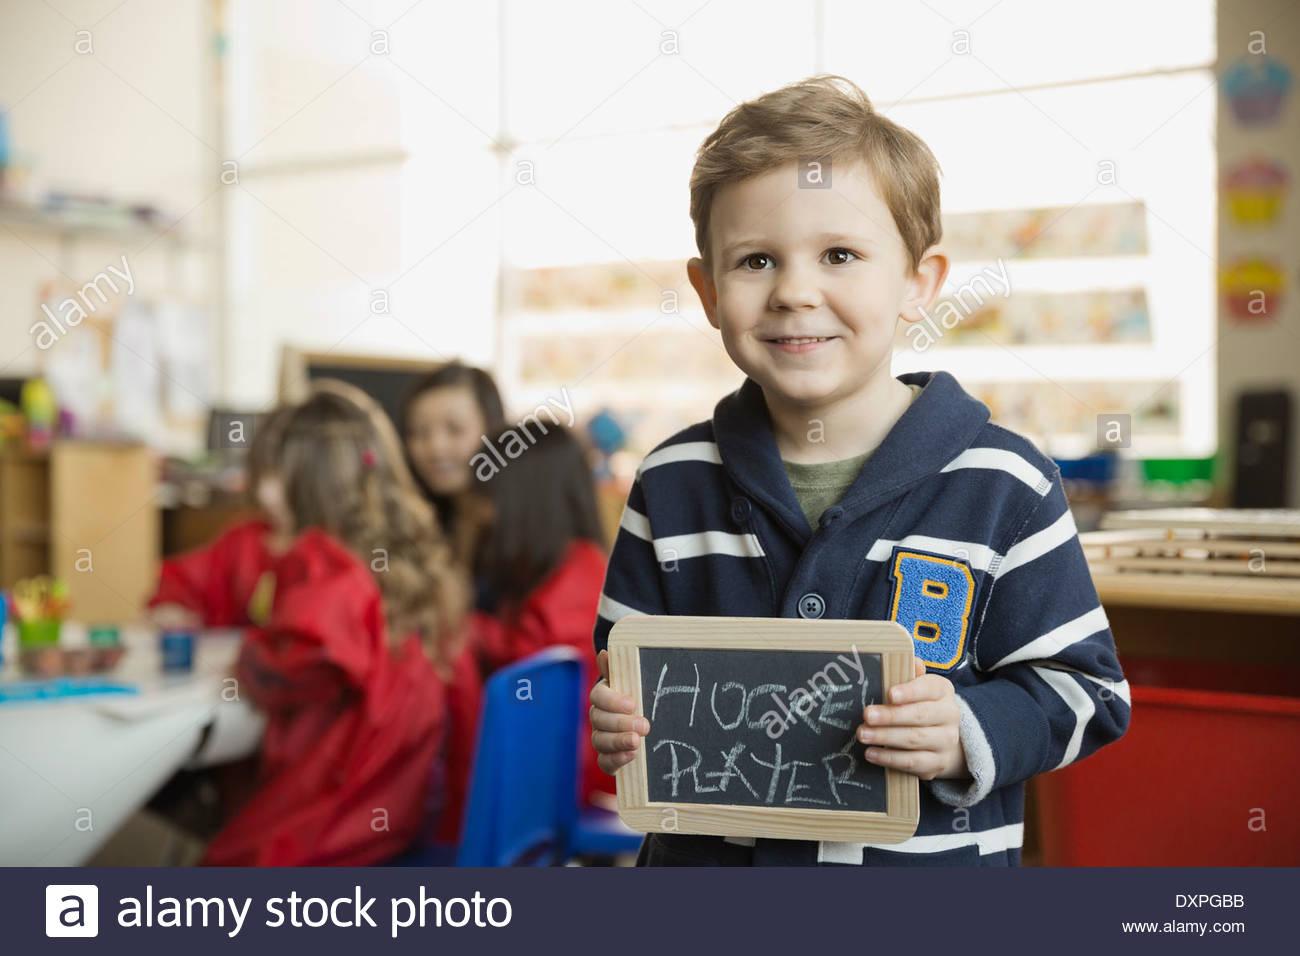 Elementary boy holding slate with 'Hockey Player' written on it - Stock Image